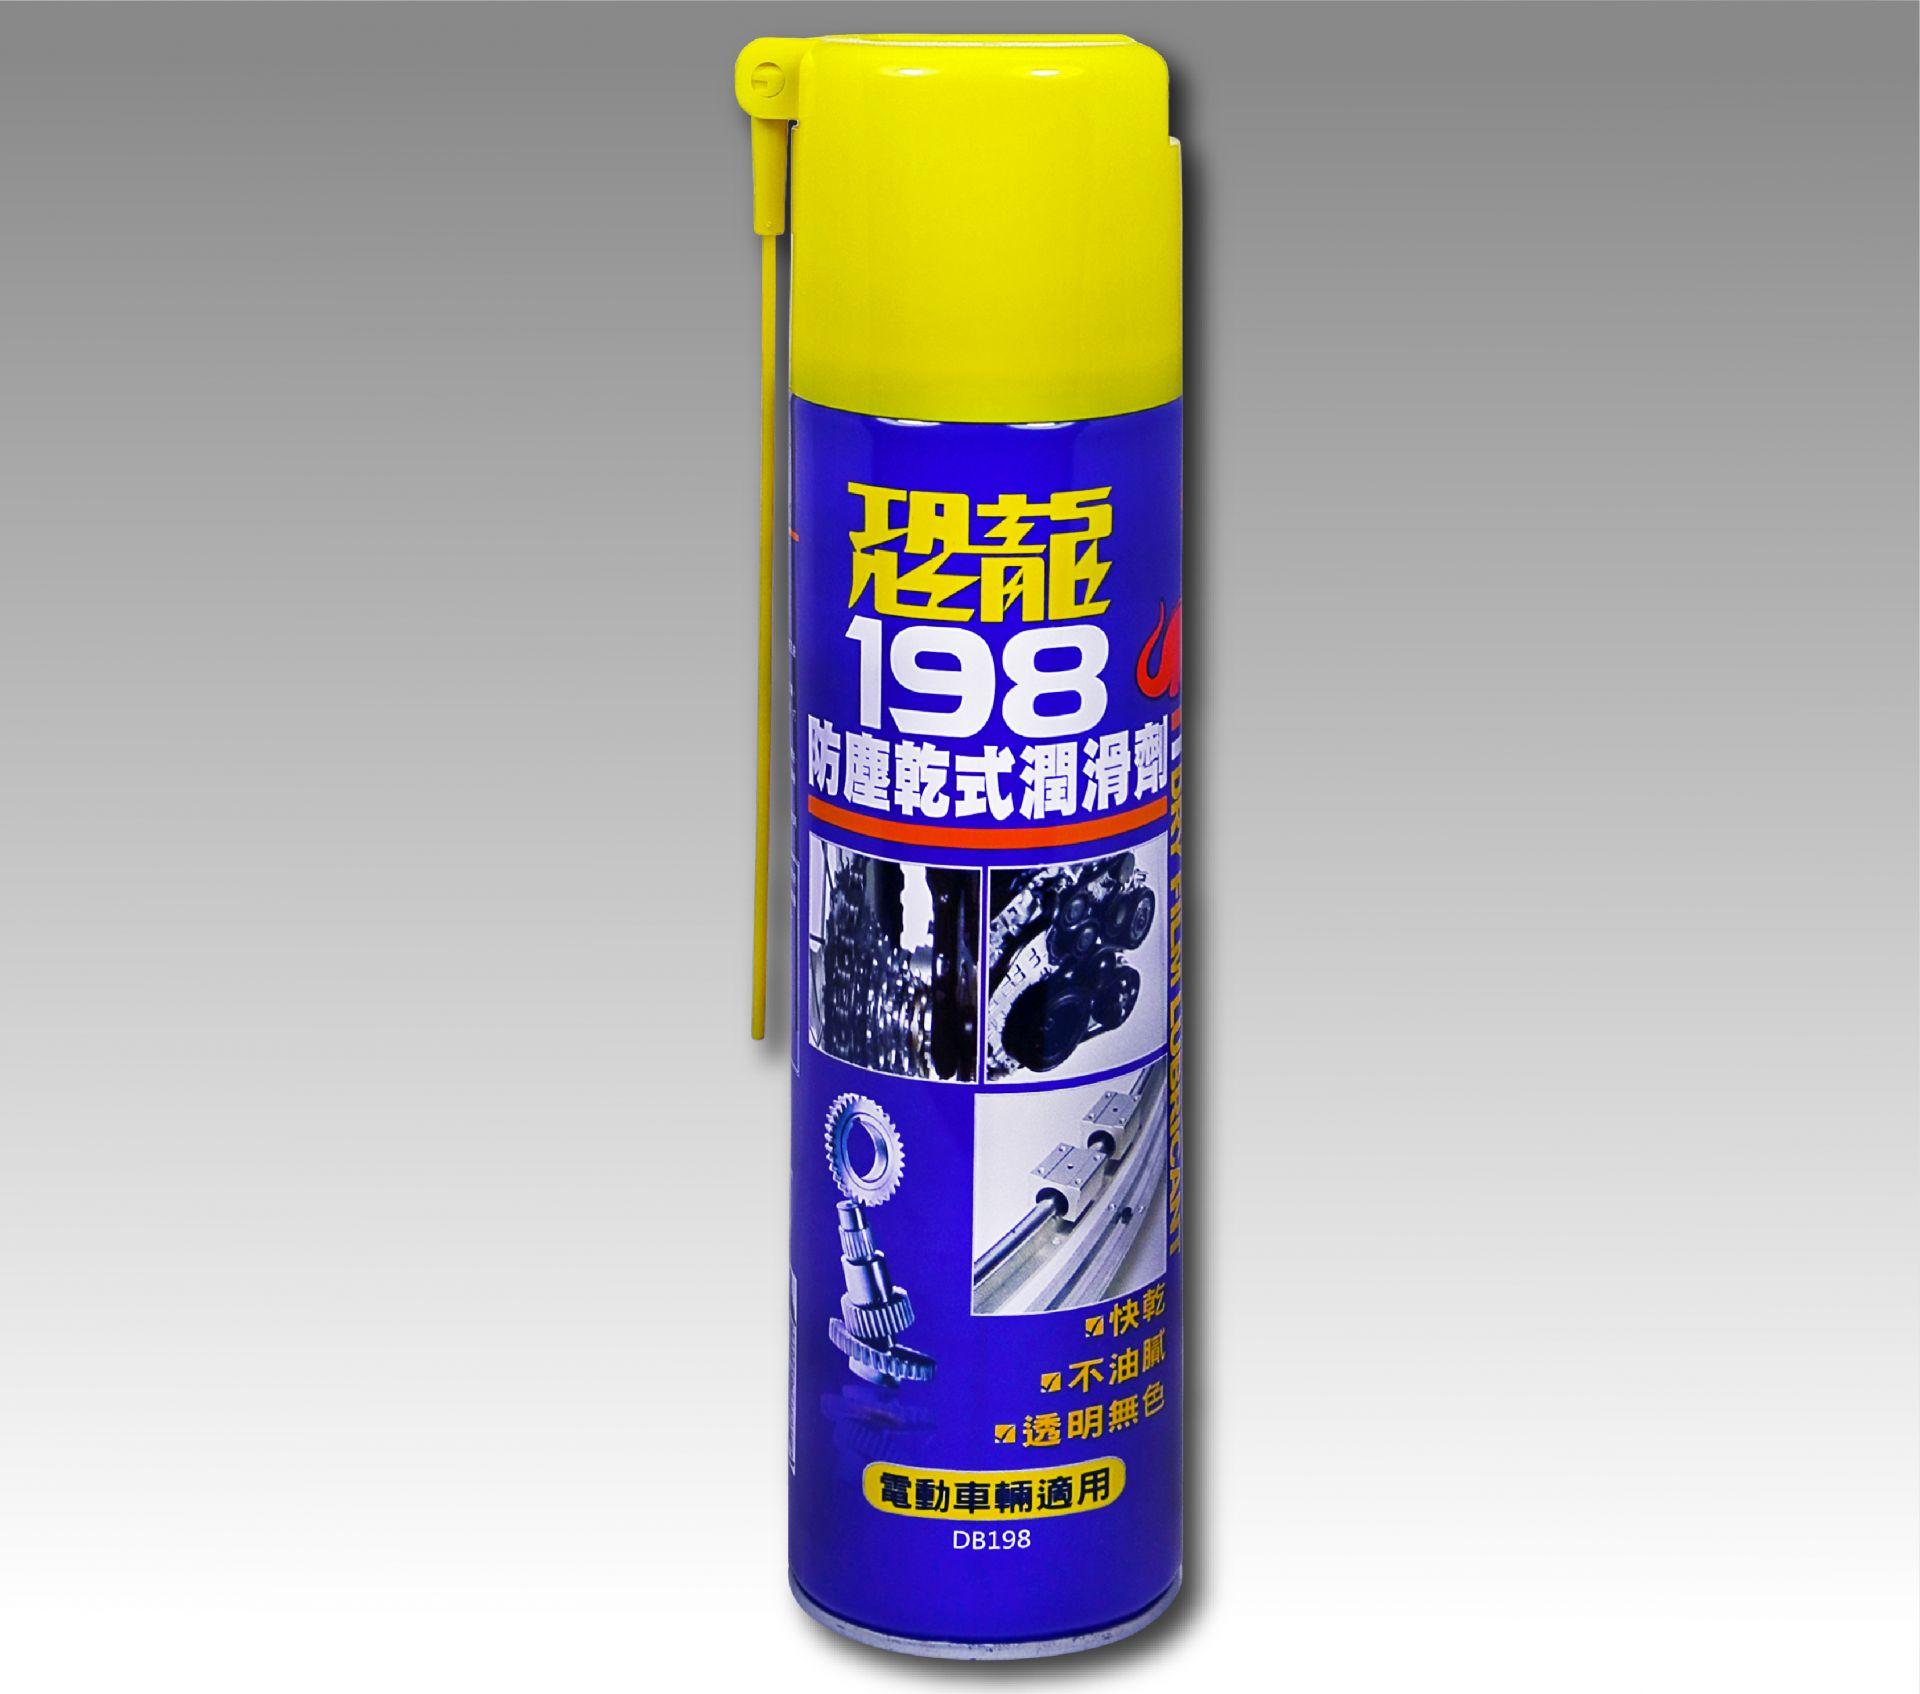 PUFF DINO 198 Semi-Dry Film Lubrication - 198 Semi-Dry Film Lubrication Spray for Roller Chain